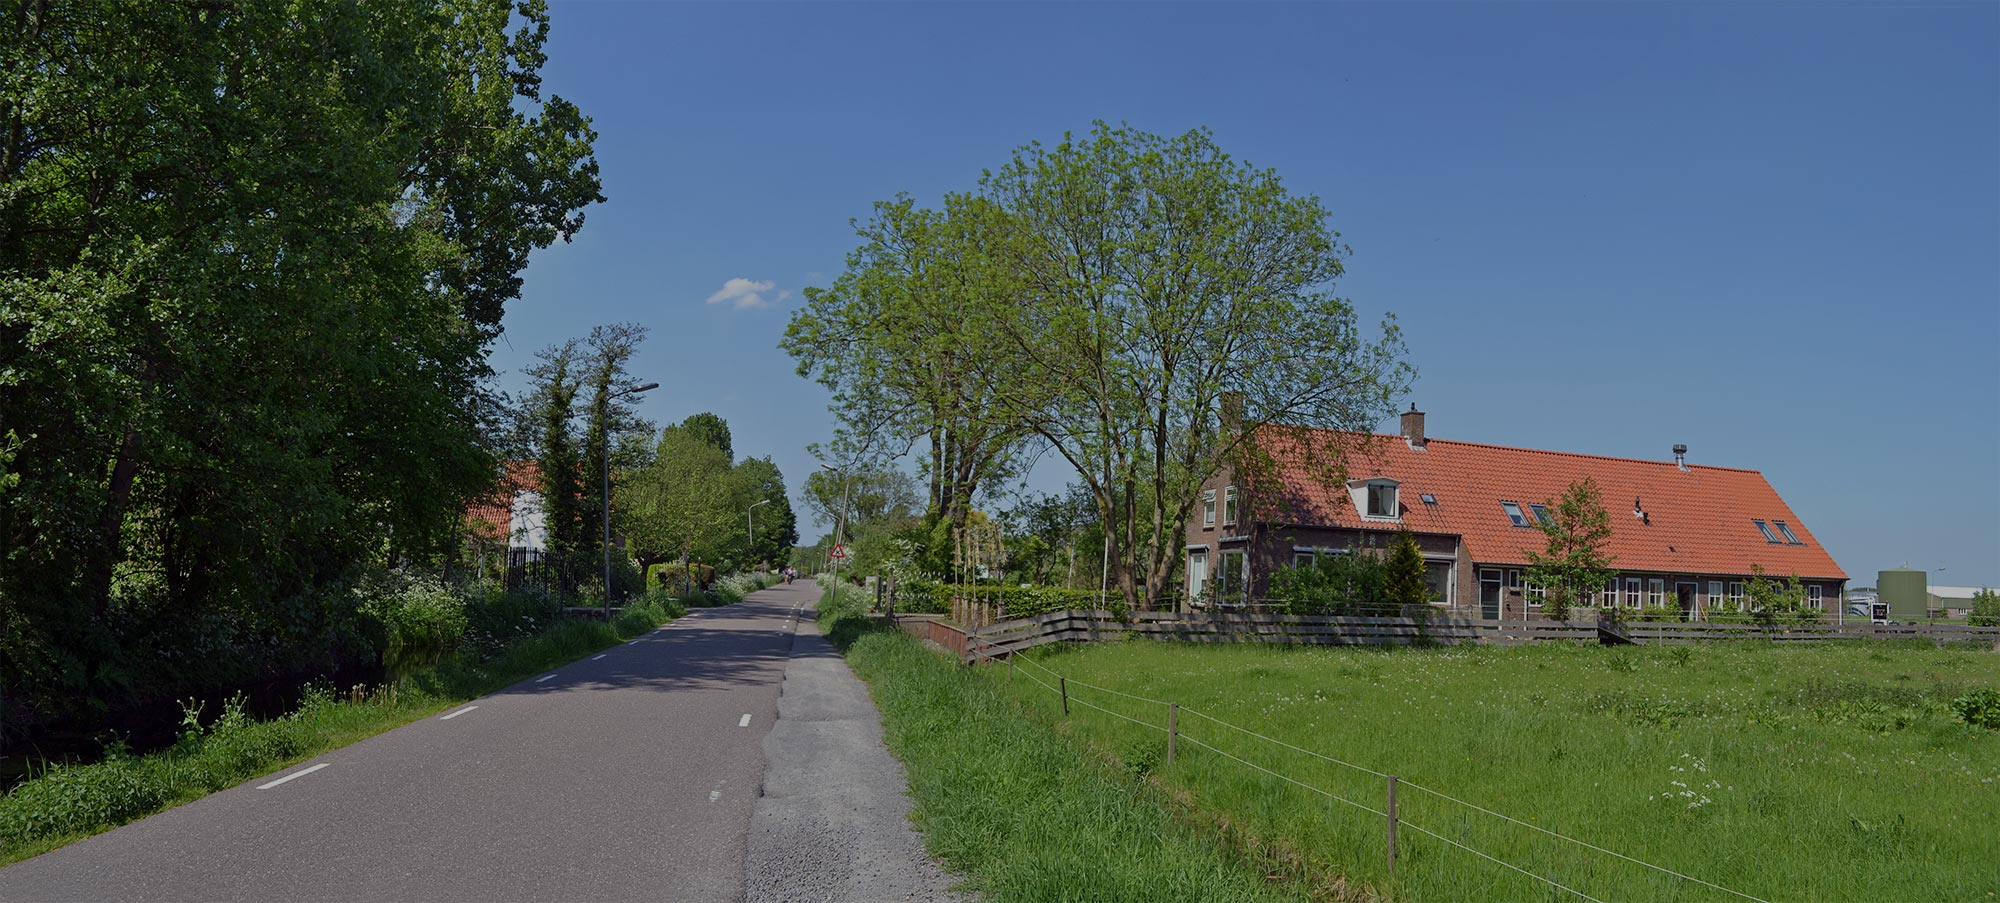 Buitengoed Leeuwenburg buitenzijde